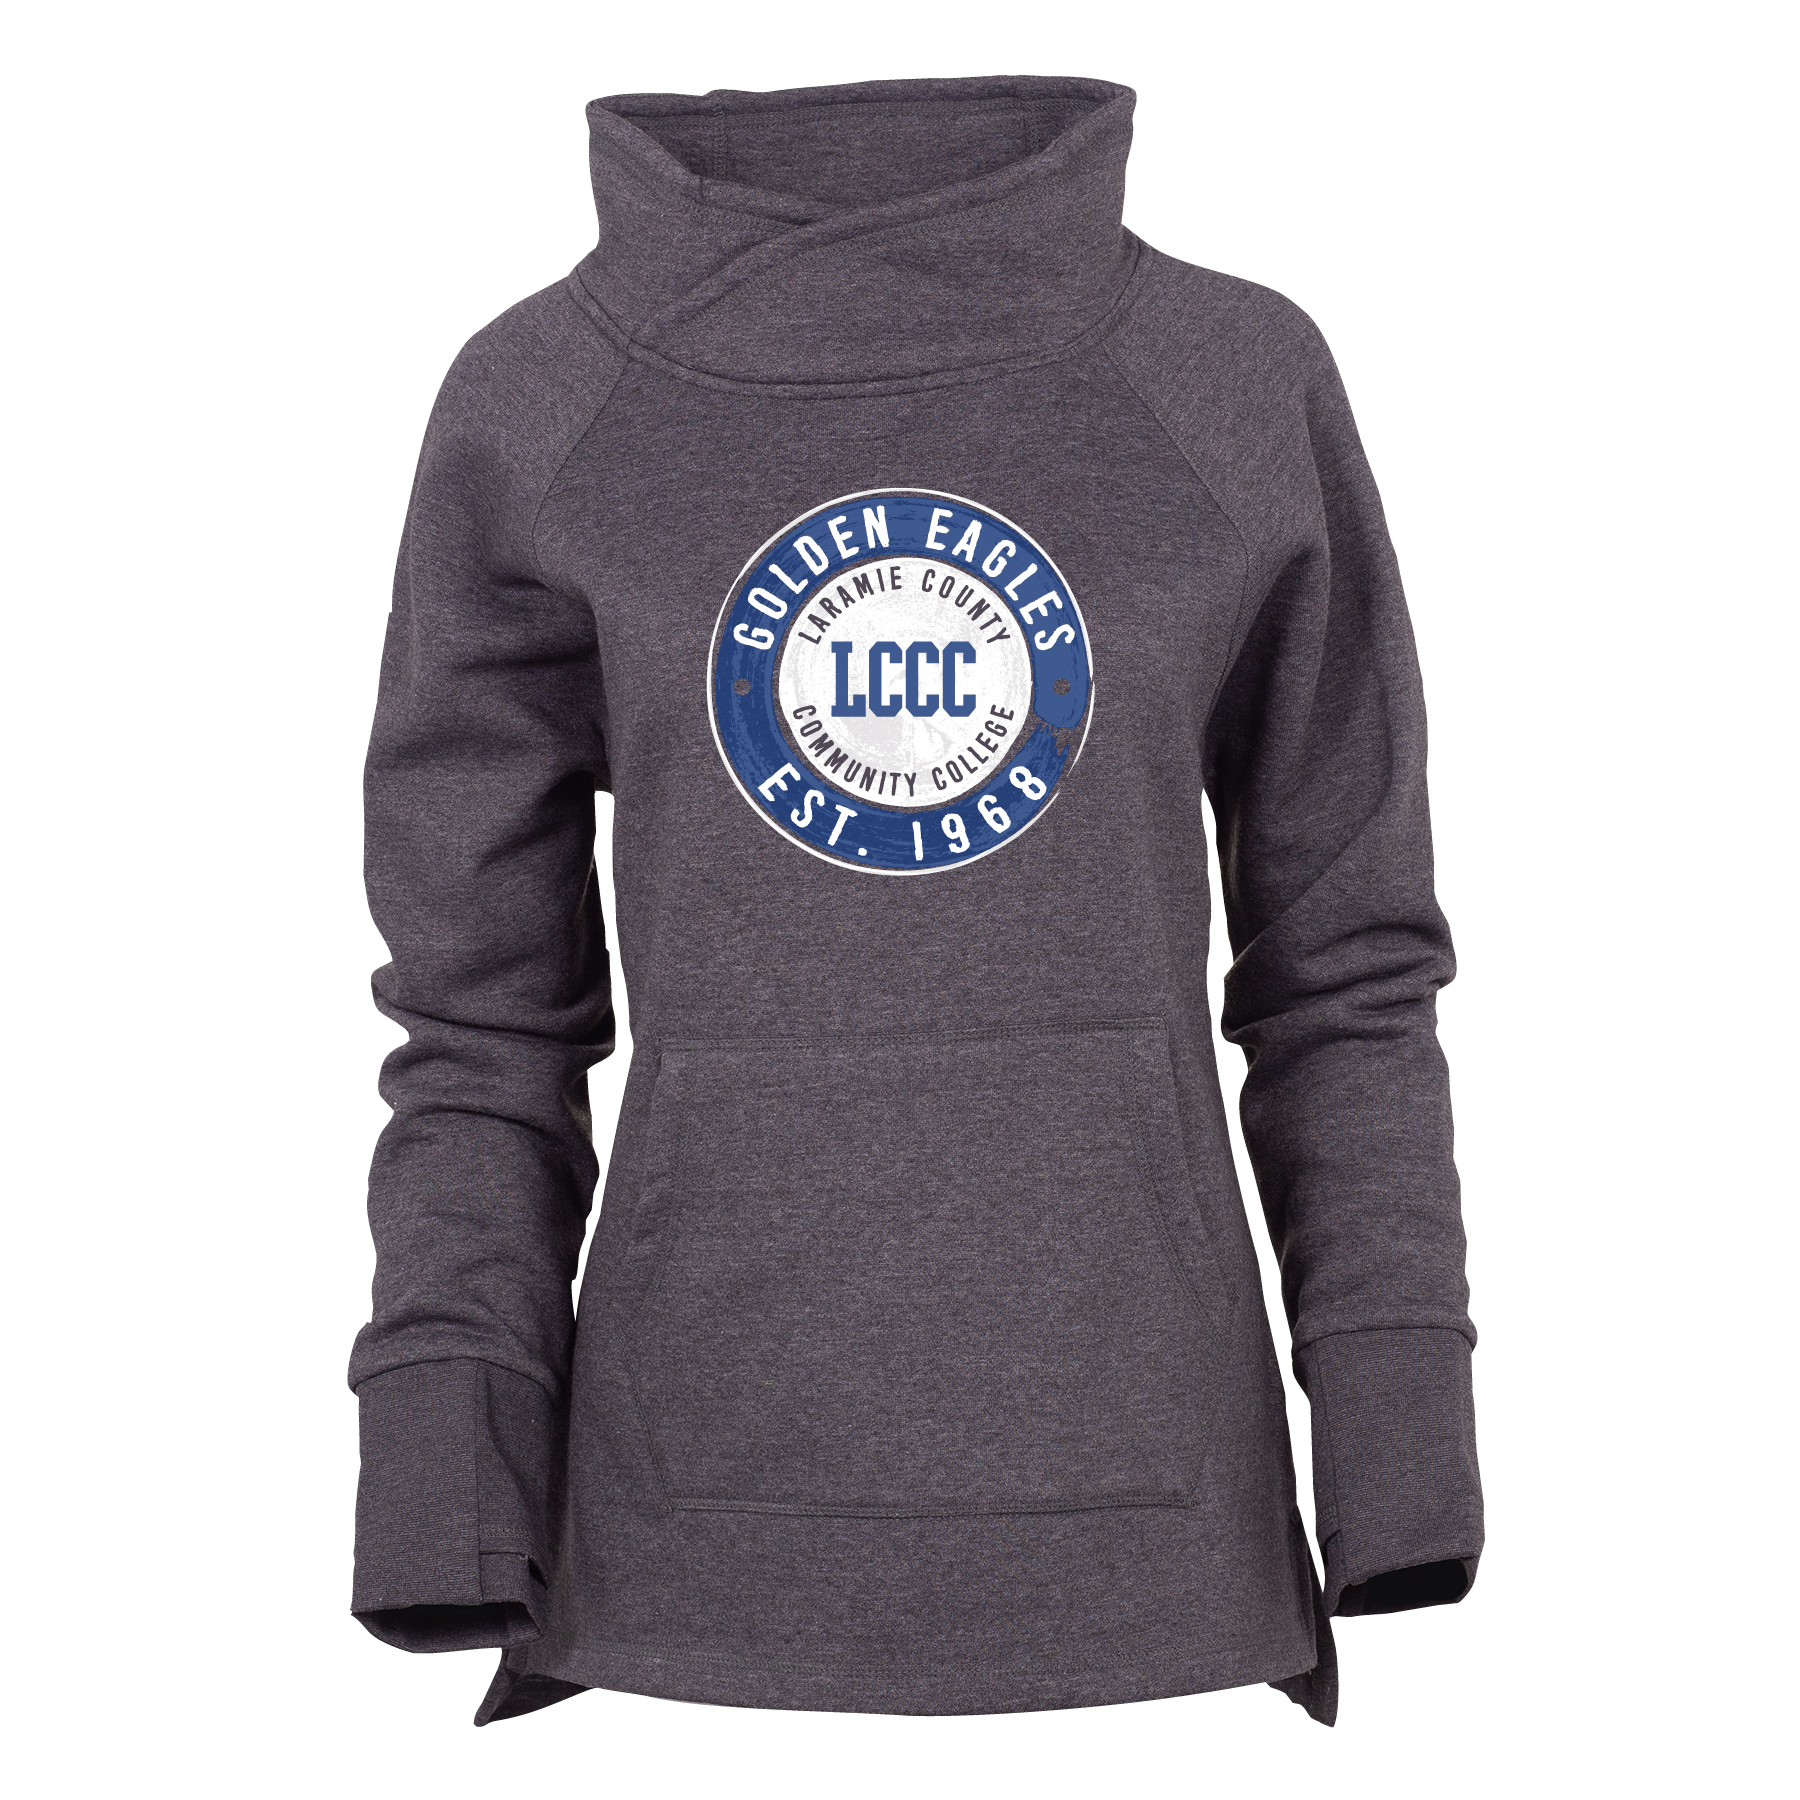 LCCC Est. 1968 Cozy Funnel Neck Sweatshirt